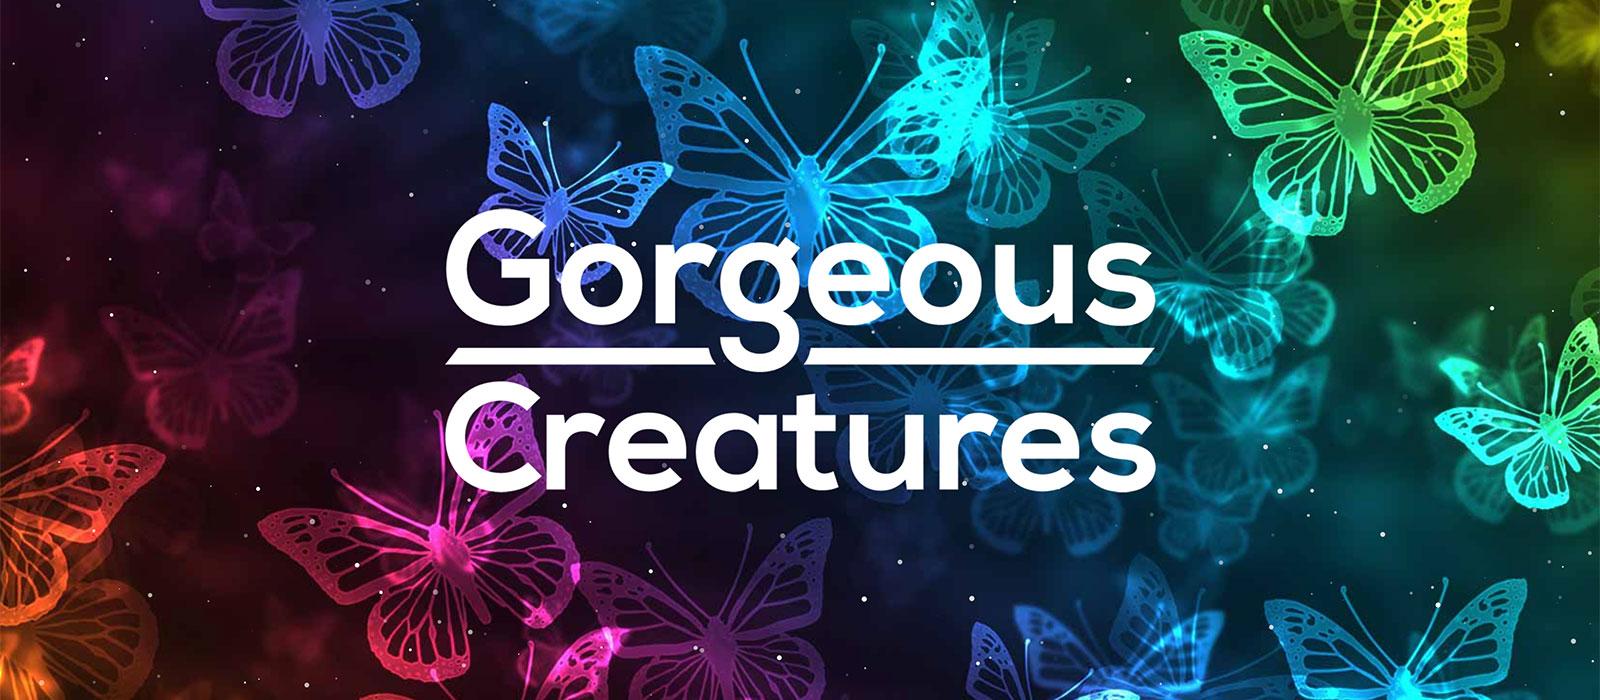 Gorgeous Creatures - Nina Santini and Brian Pedley